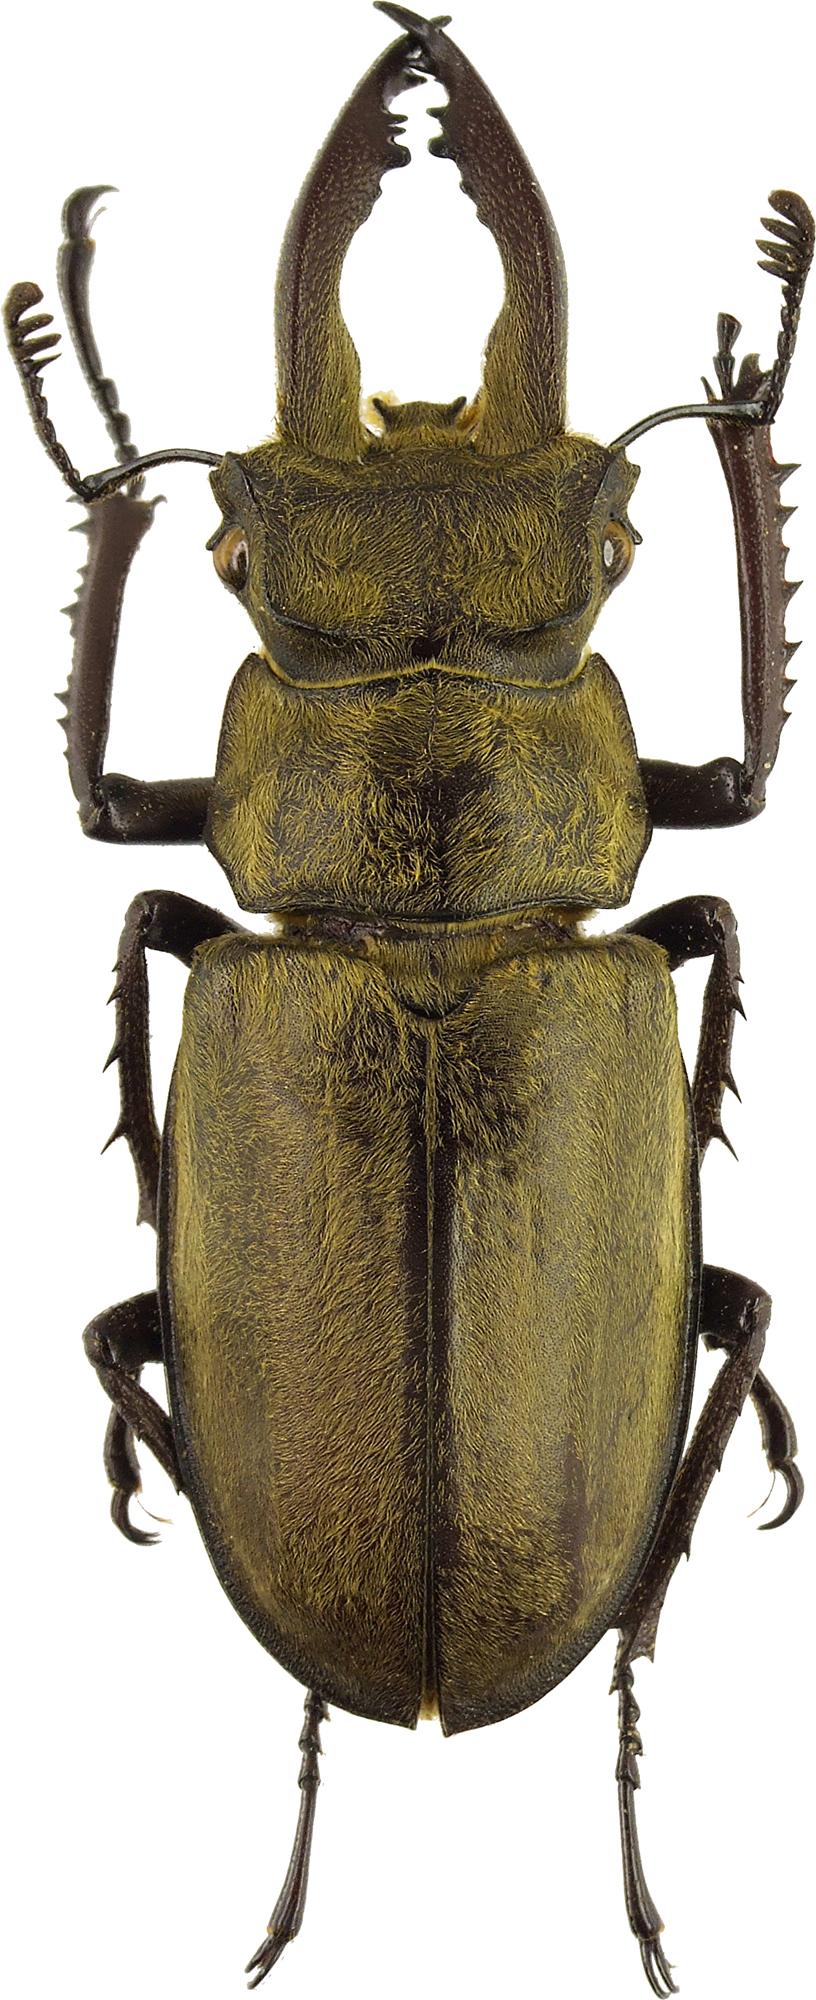 Lucanus pseudosingularis 41729cz31.jpg